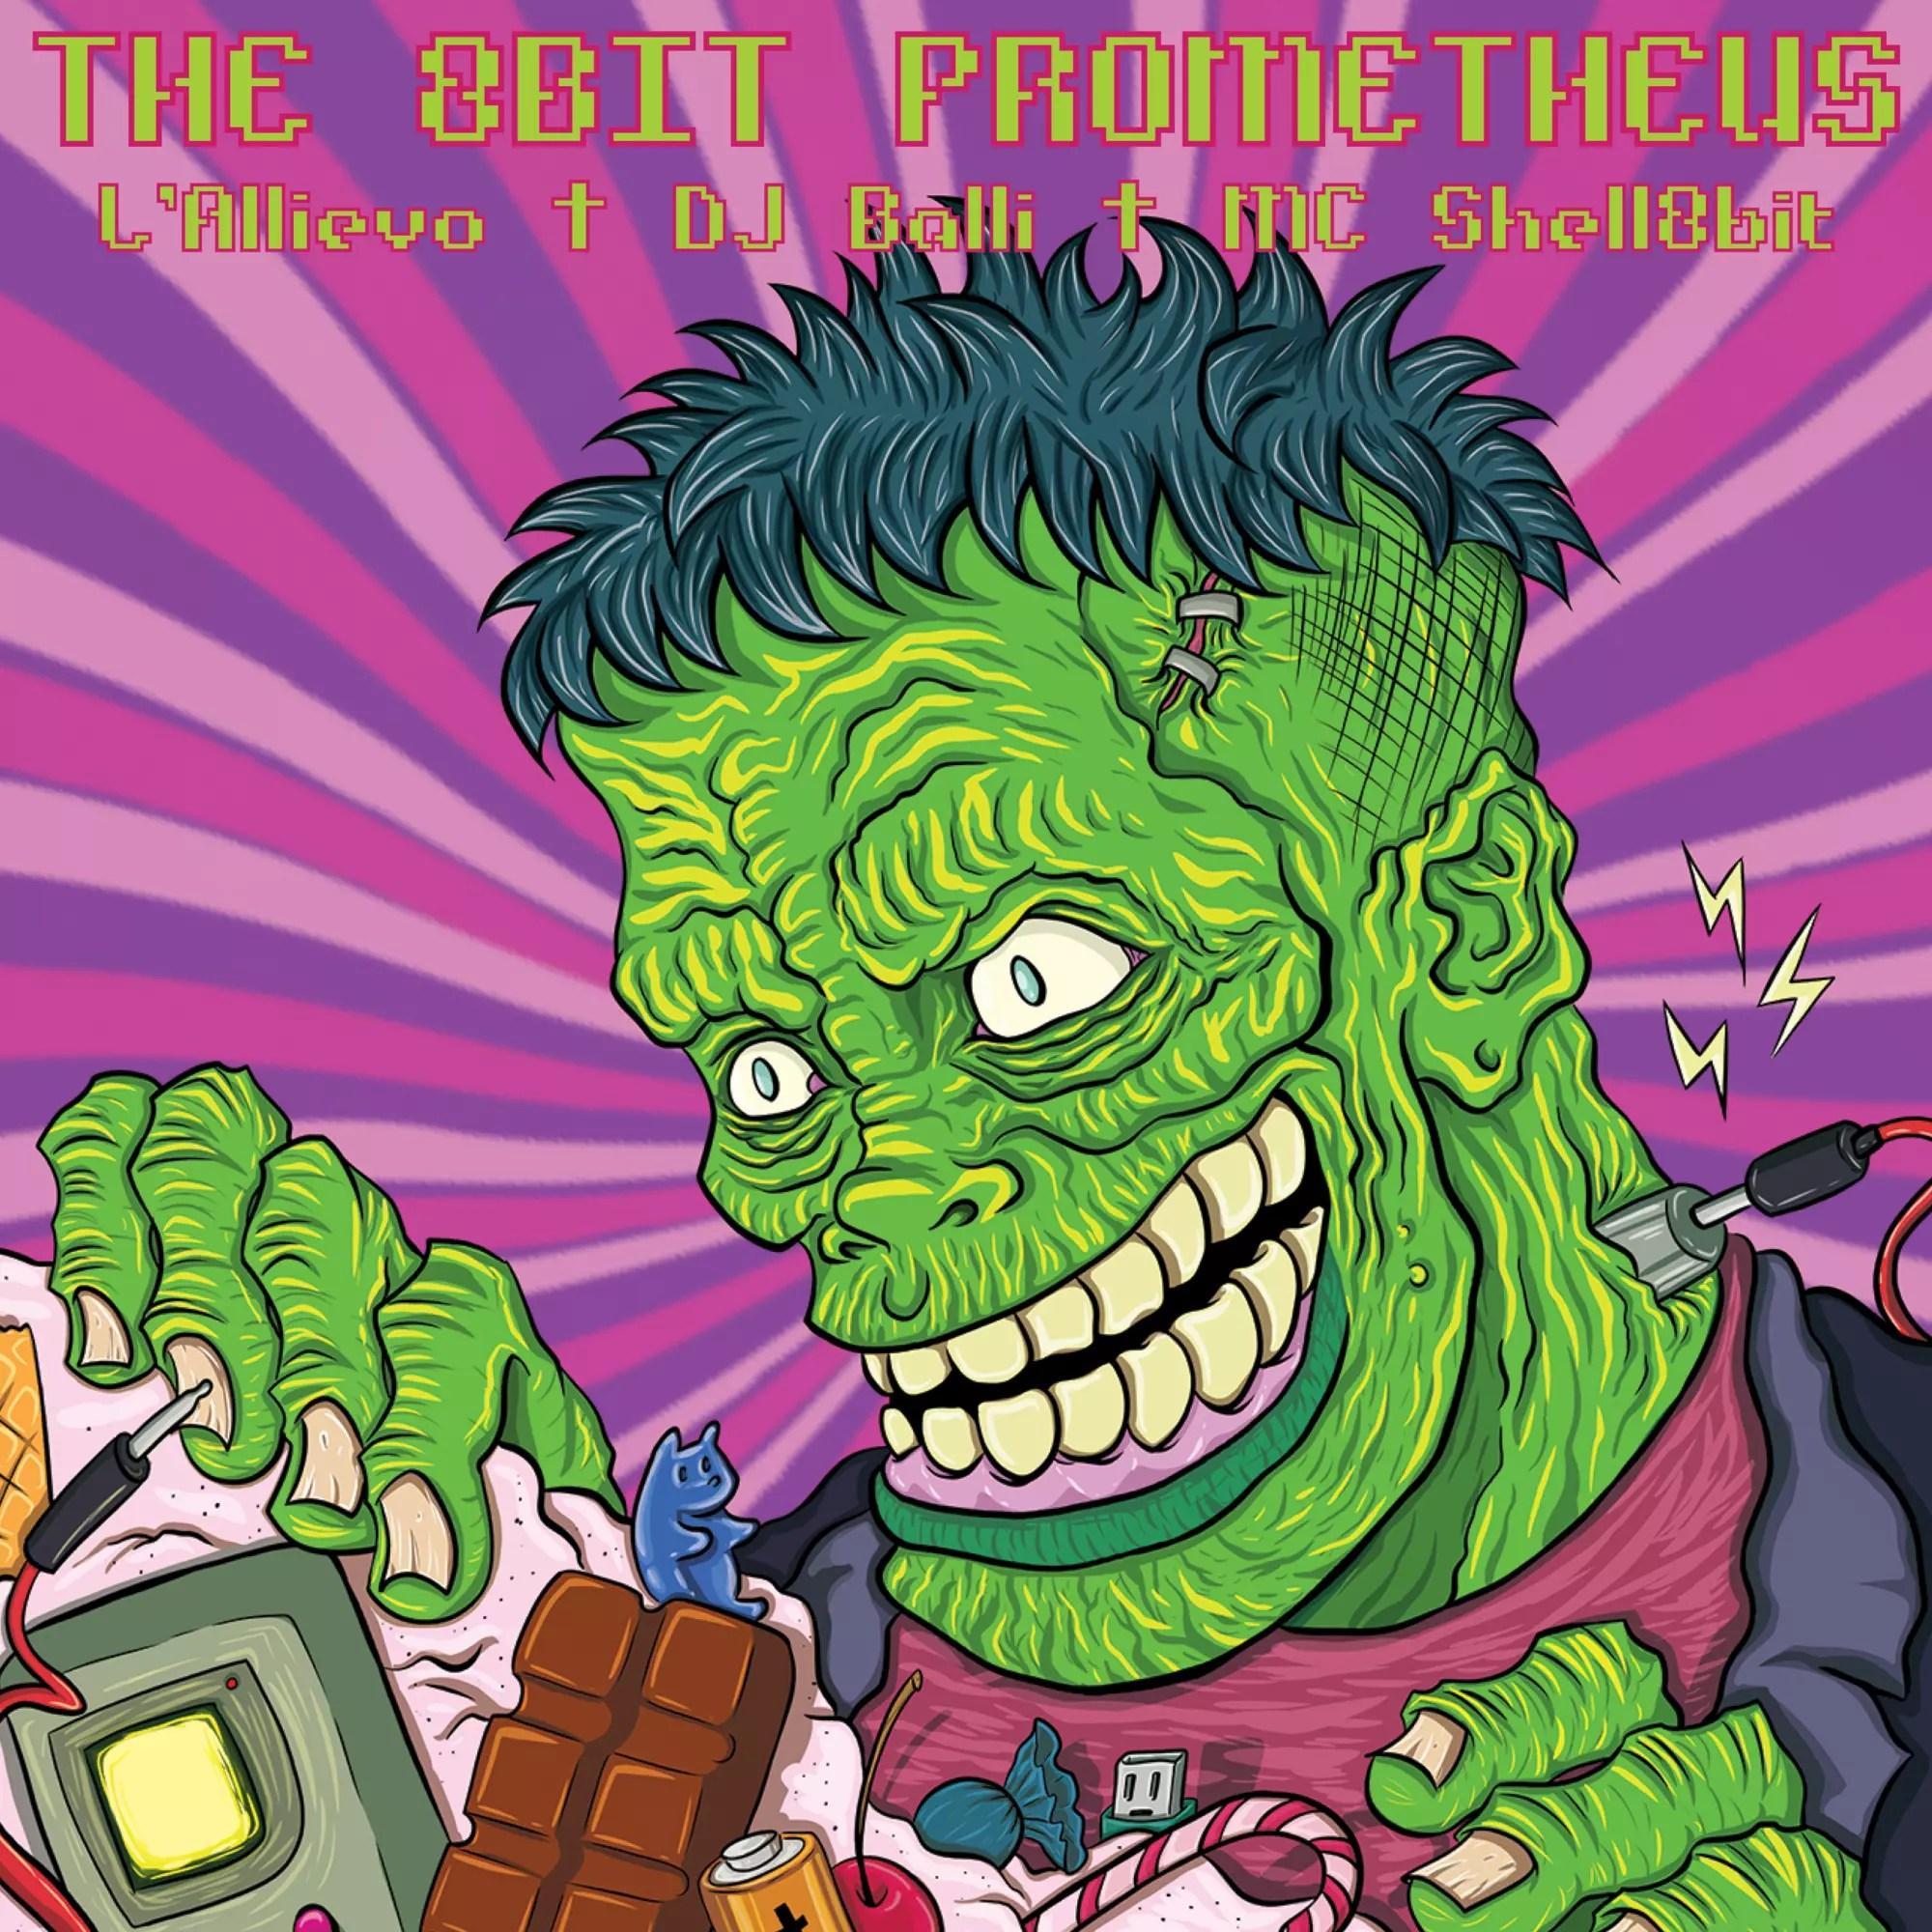 Dj Balli - The 8 bit Prometheus